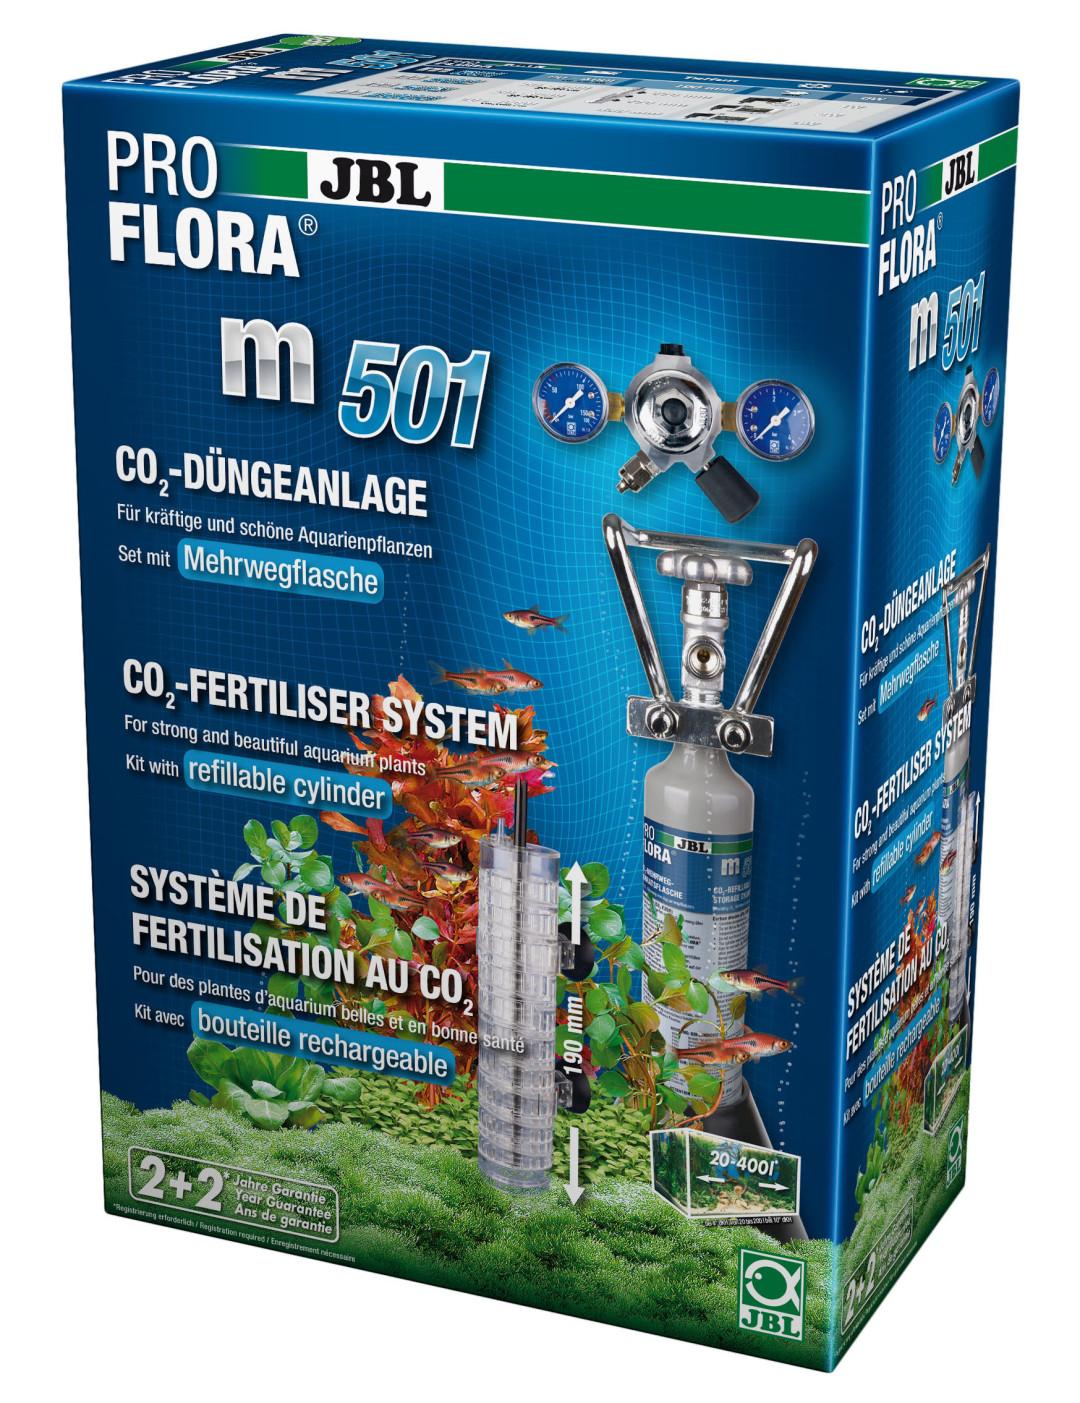 JBL CO2-set ProFlora m501+